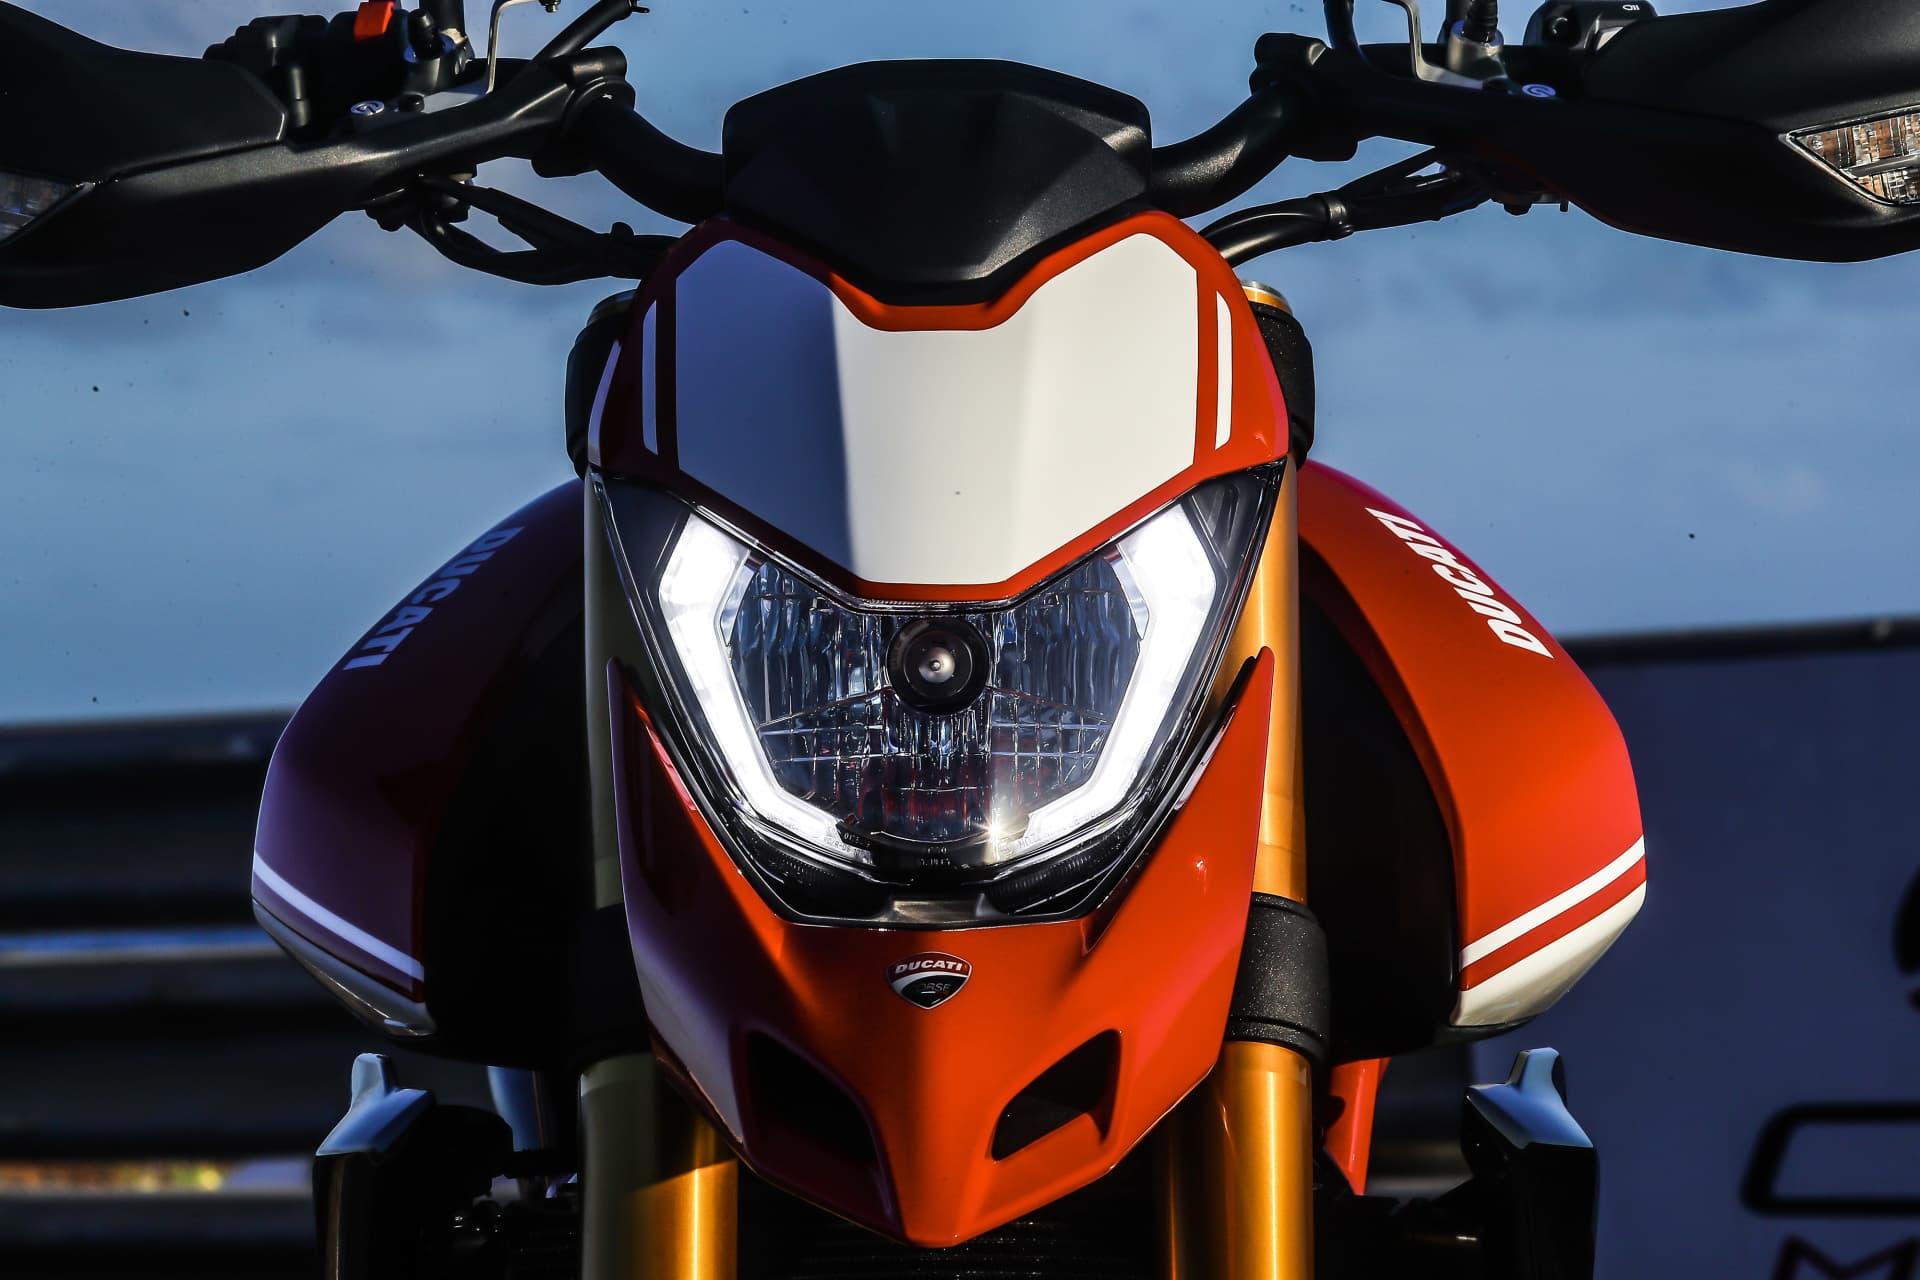 Ducati Hypermotard 950 Sp Static 32 Uc70292 Mid